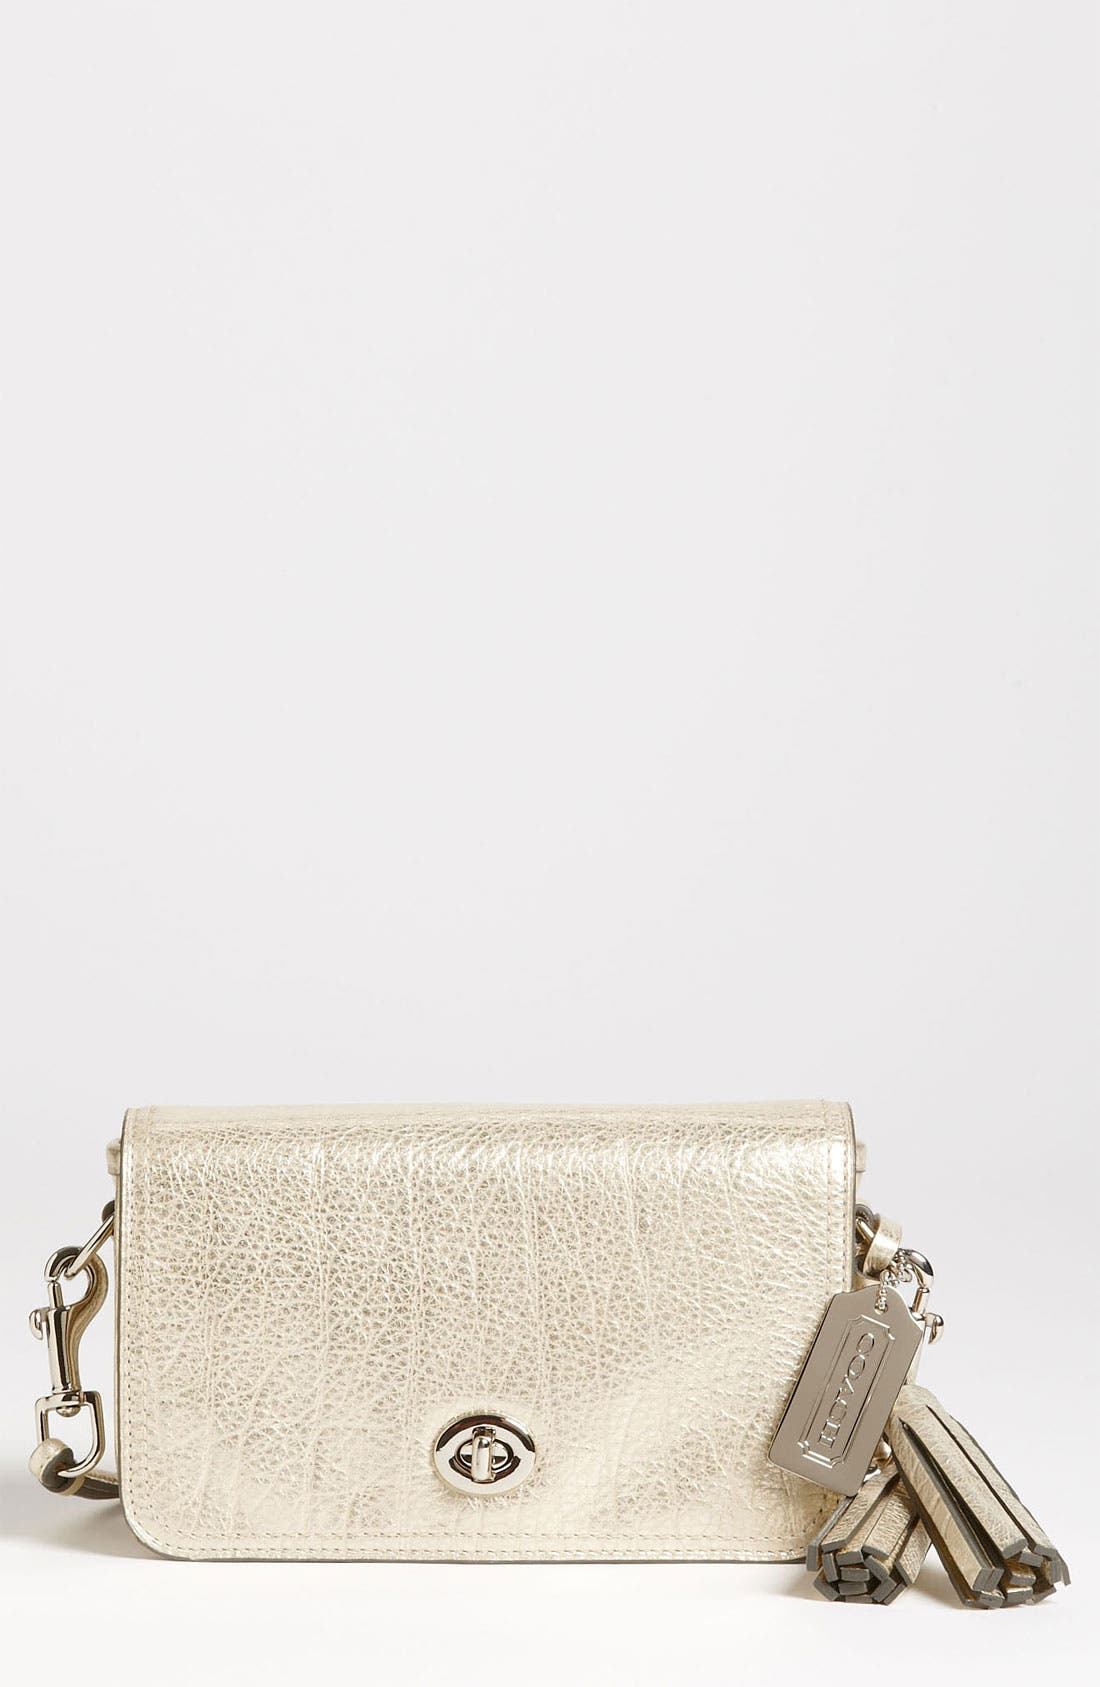 Alternate Image 1 Selected - COACH 'Legacy - Penny' Metallic Leather Crossbody Bag